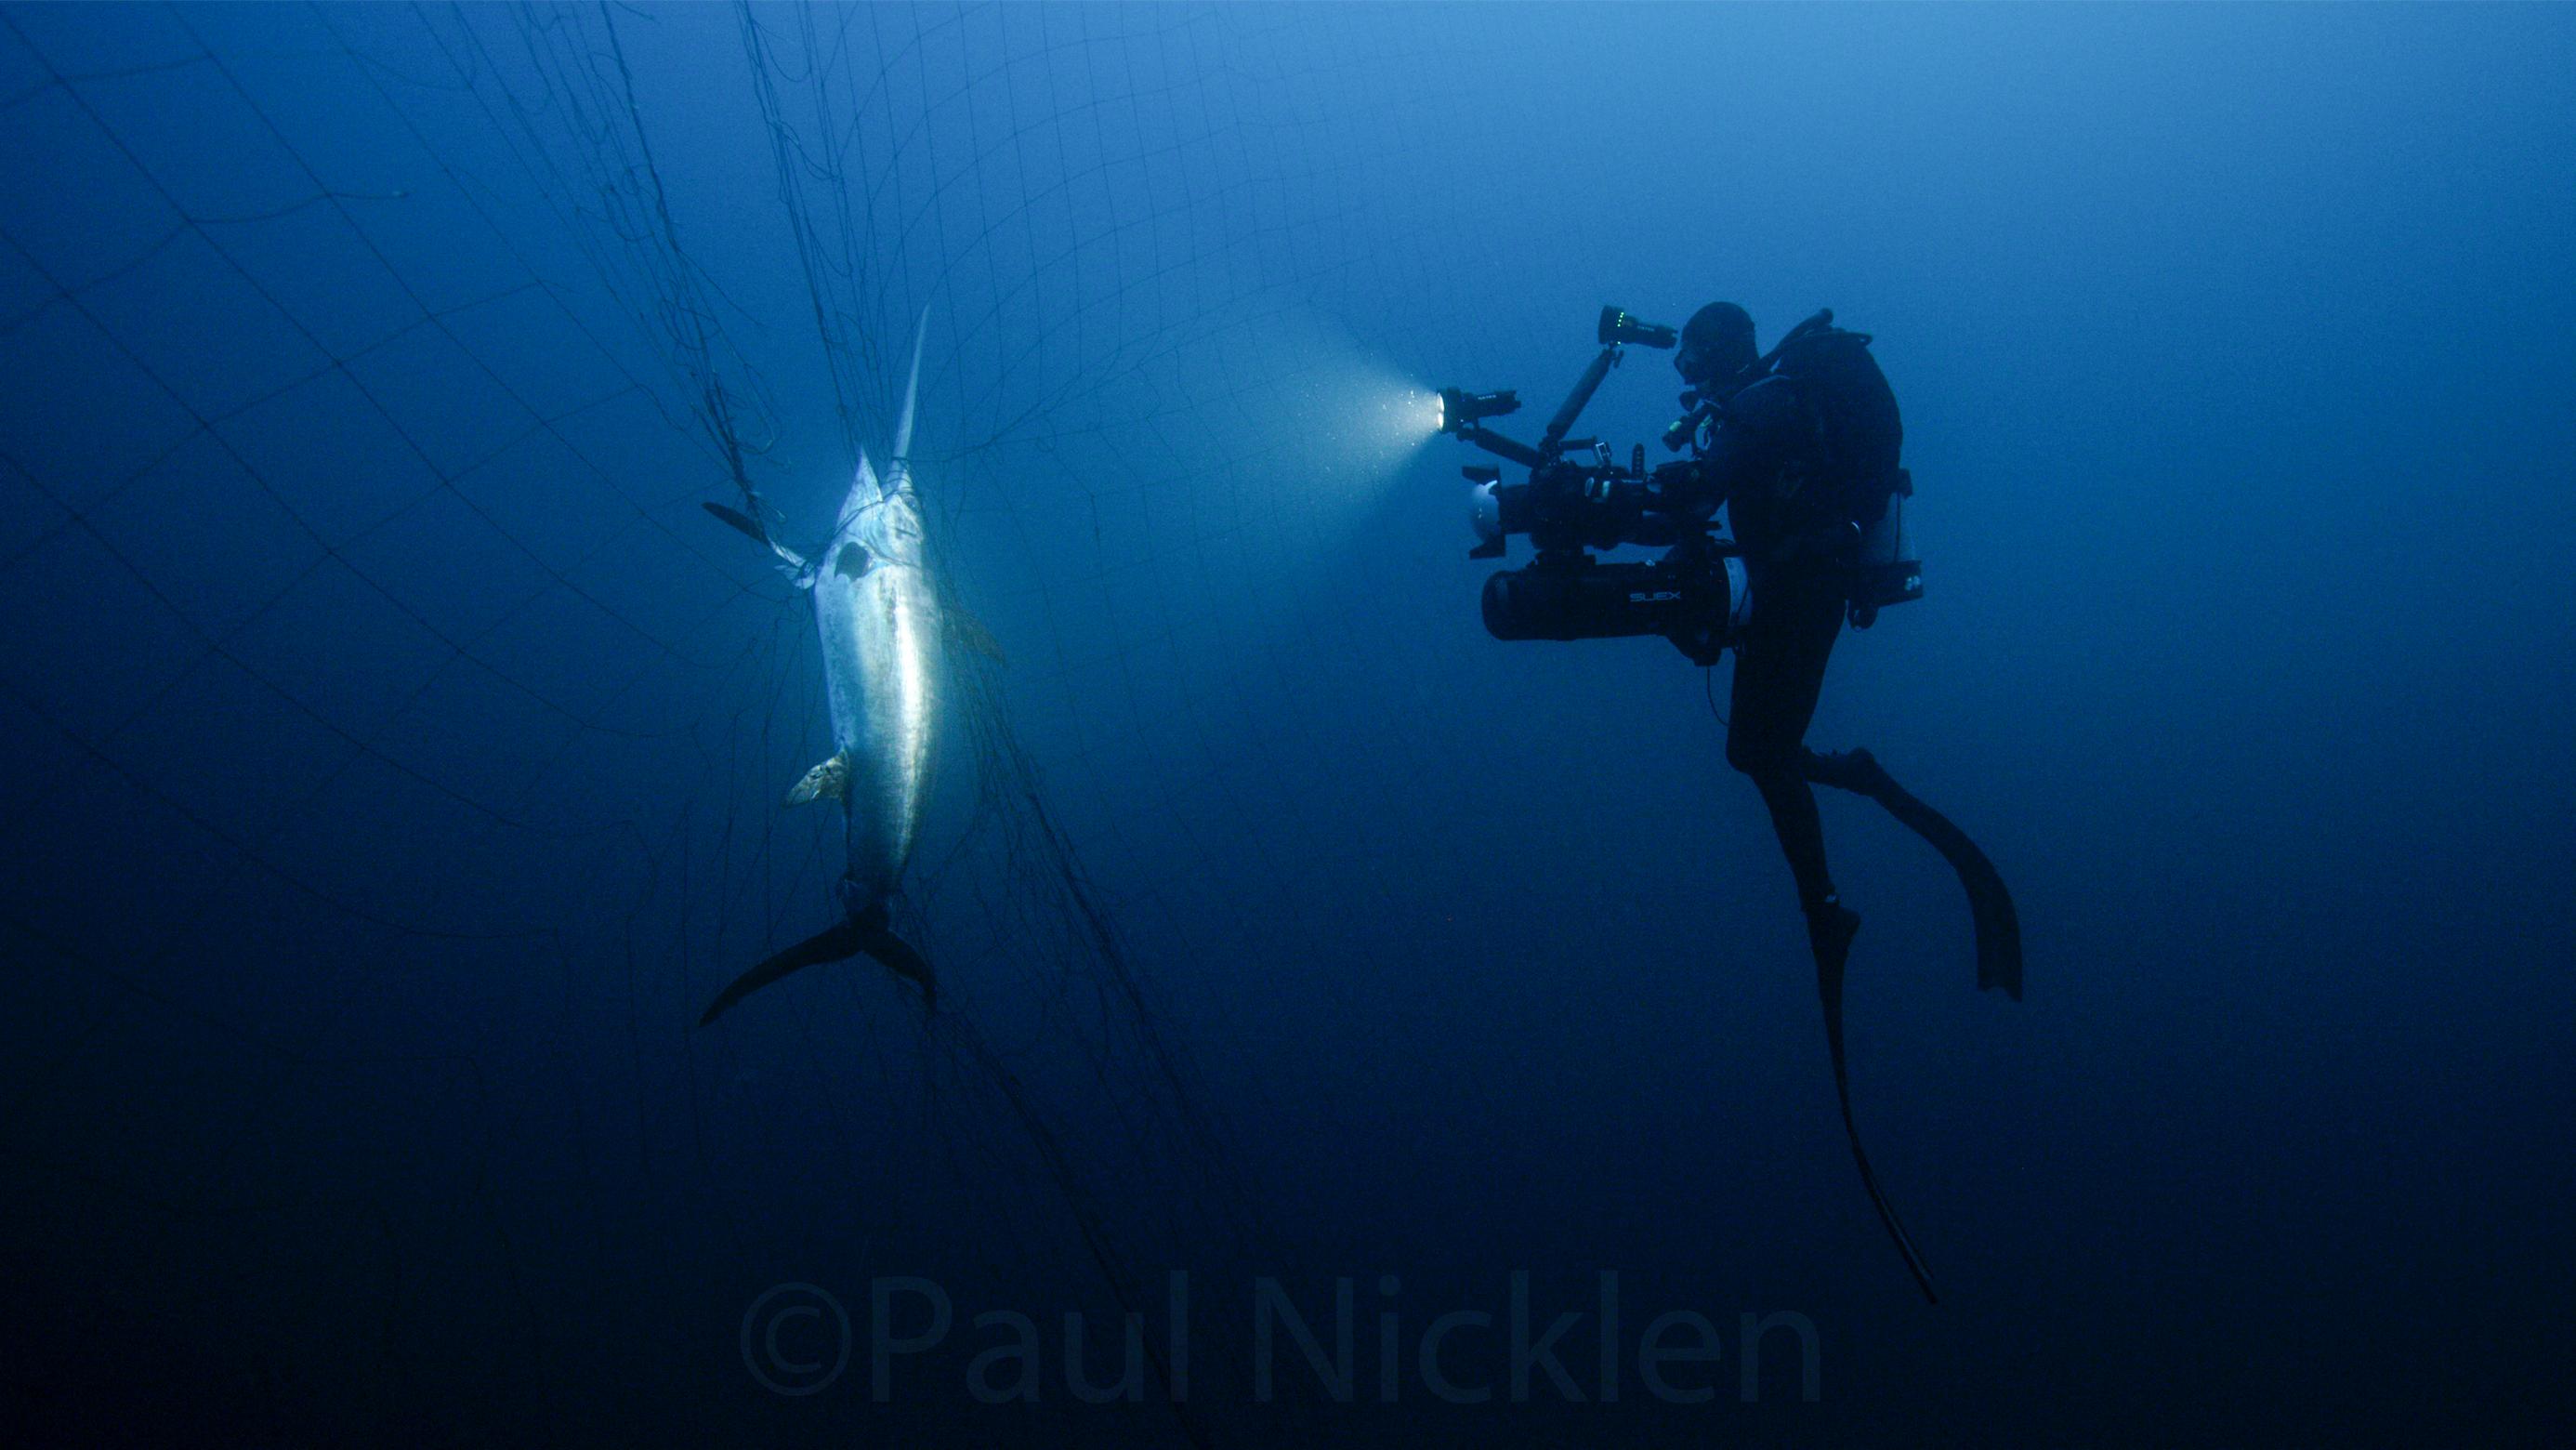 Swordfish Caught in a Driftnet